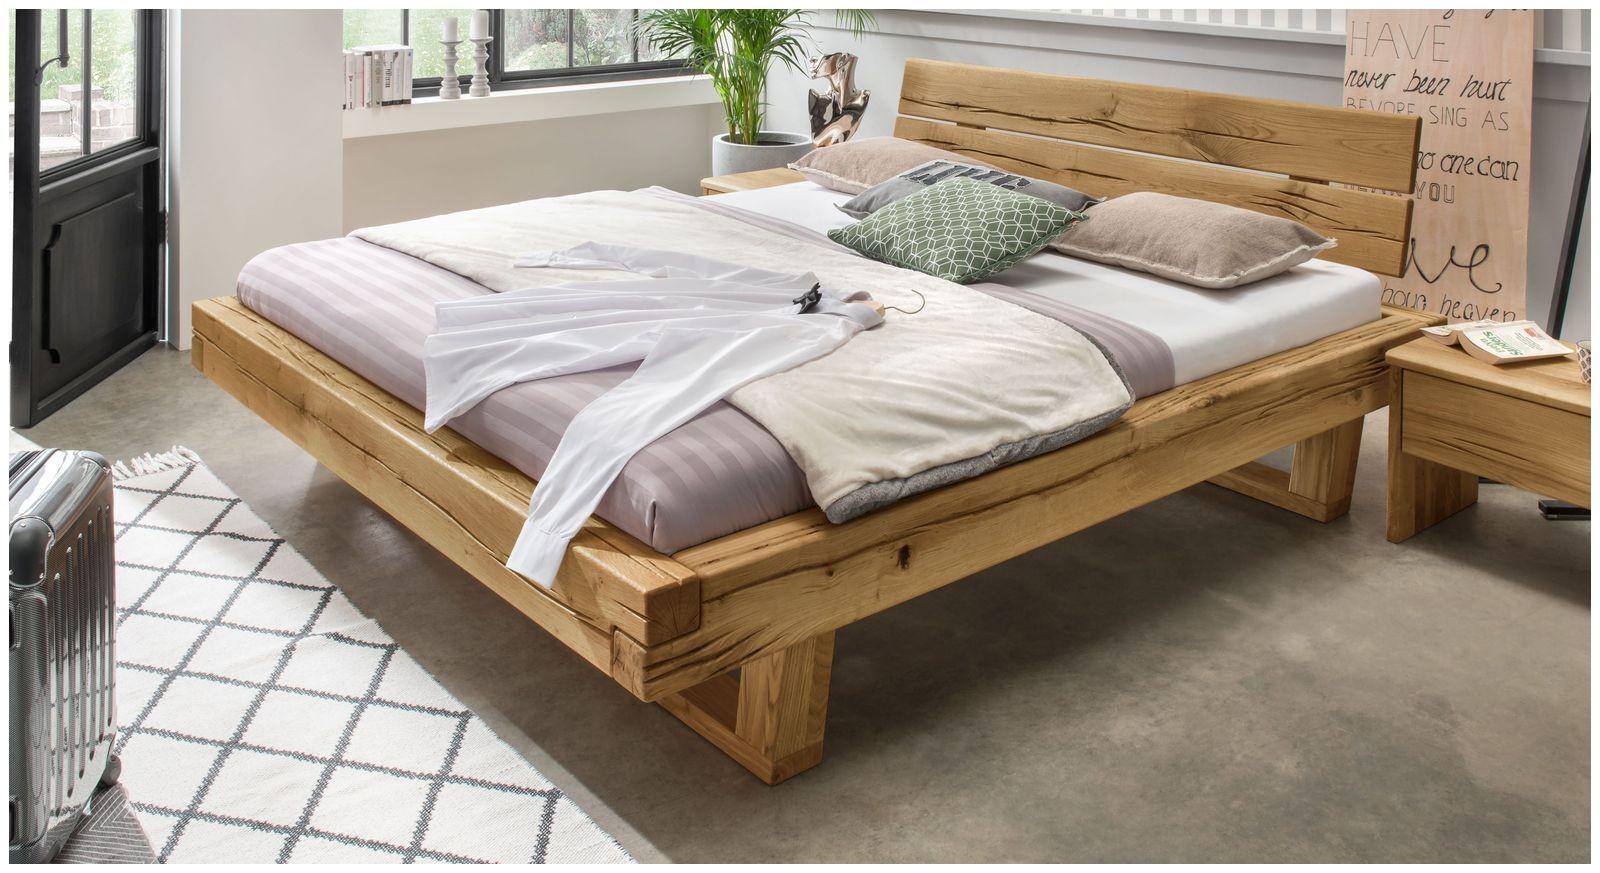 rustikales bett stabiles balkenbett aus hochwertigem wildeichenholz rigolato of rustikales bett